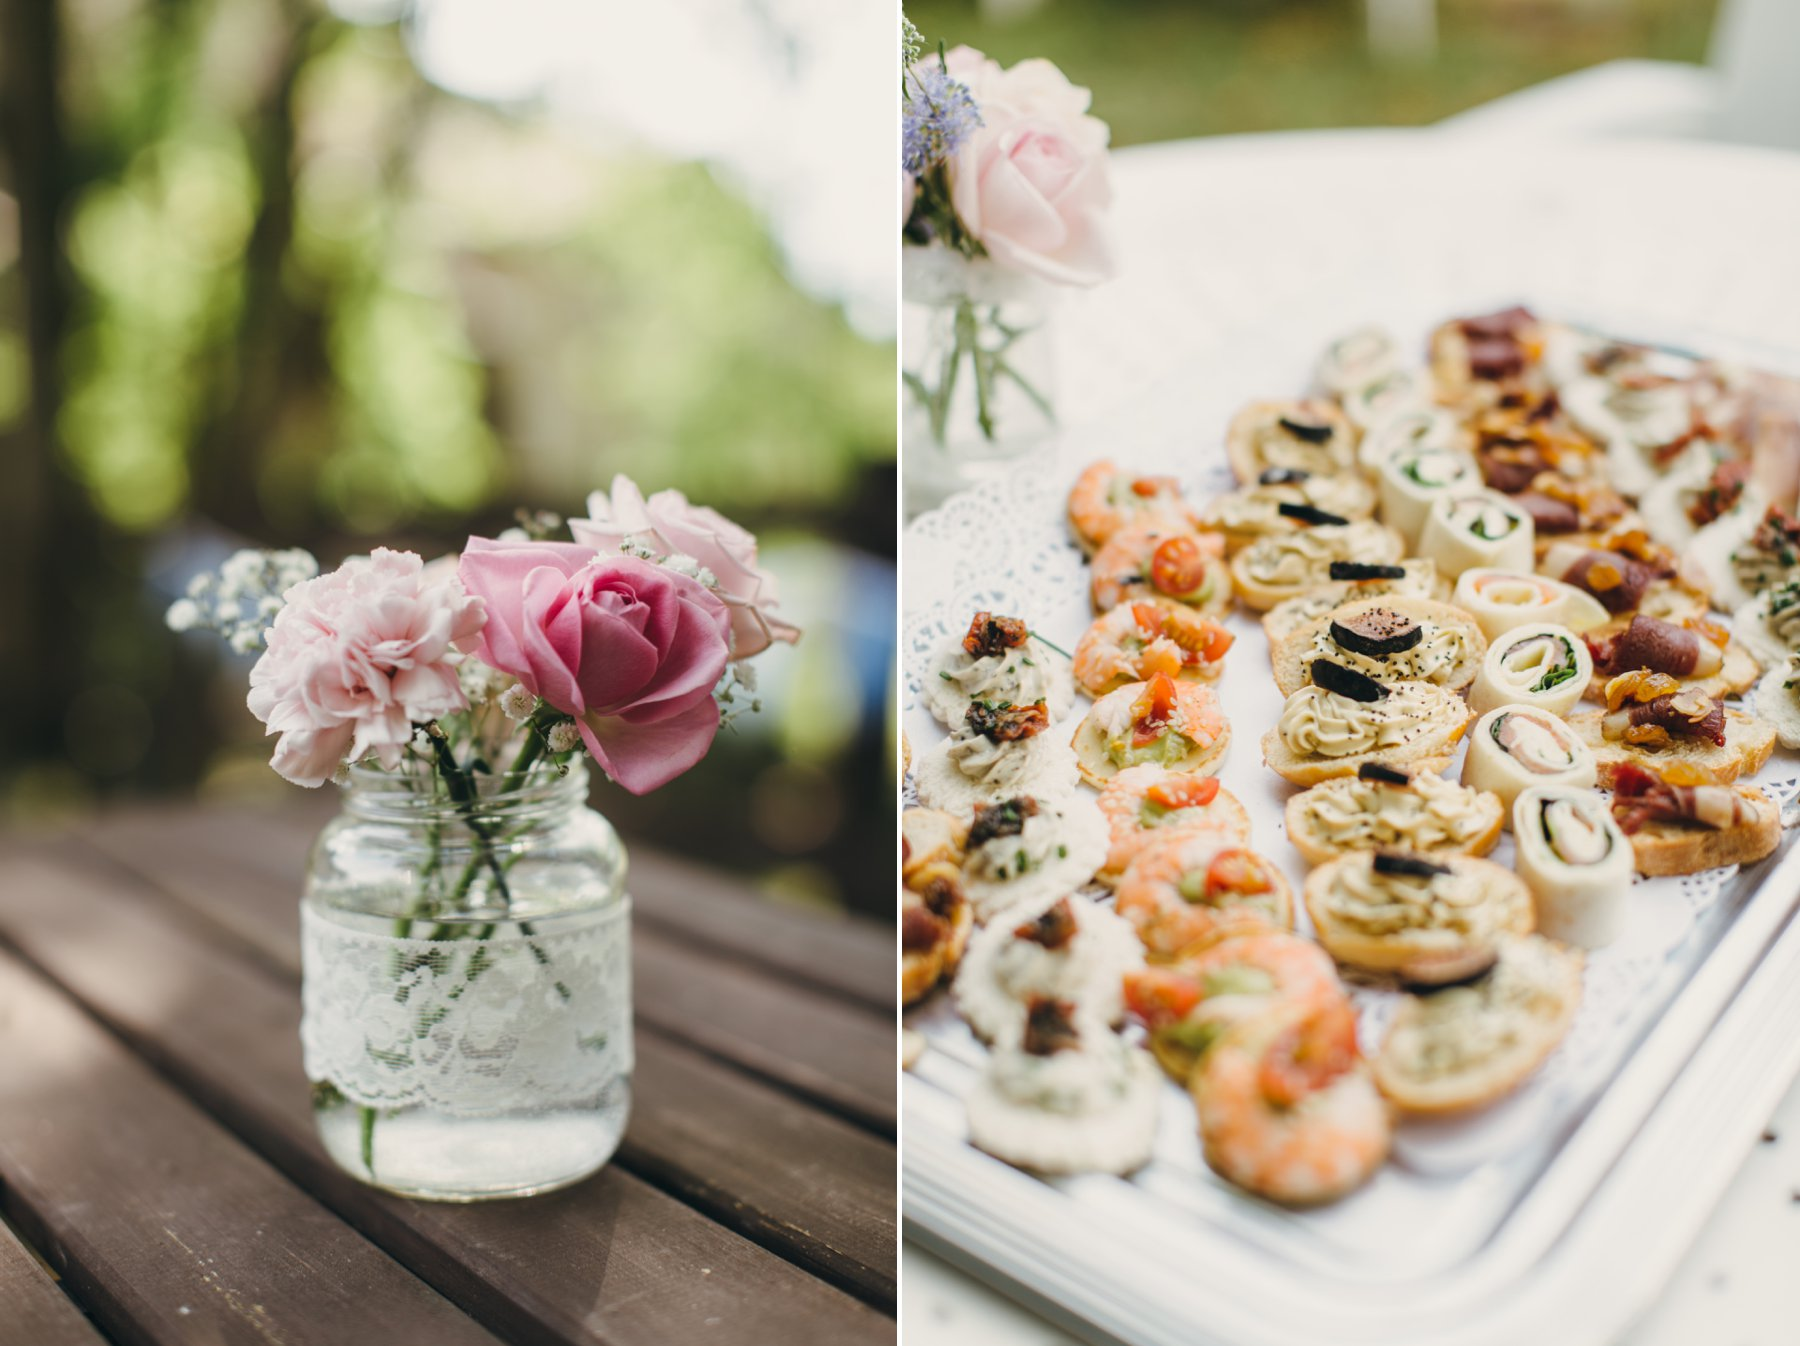 petitmoulin_france_bordeaux_weddings_0052